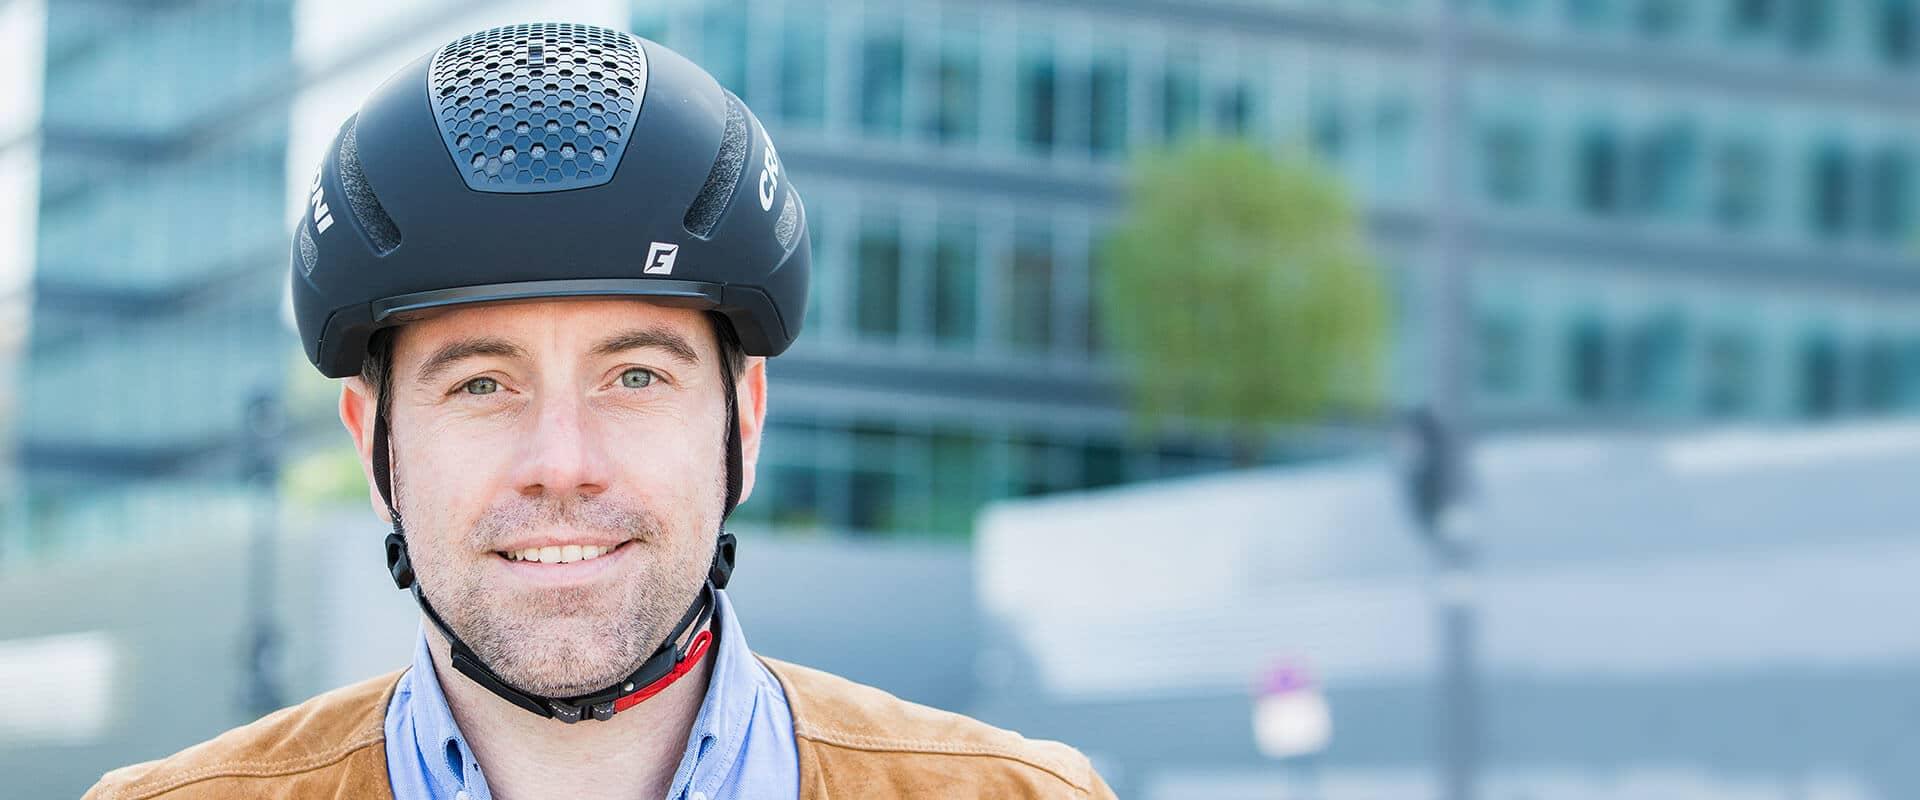 Schwarzer Helm fürs E-Bike